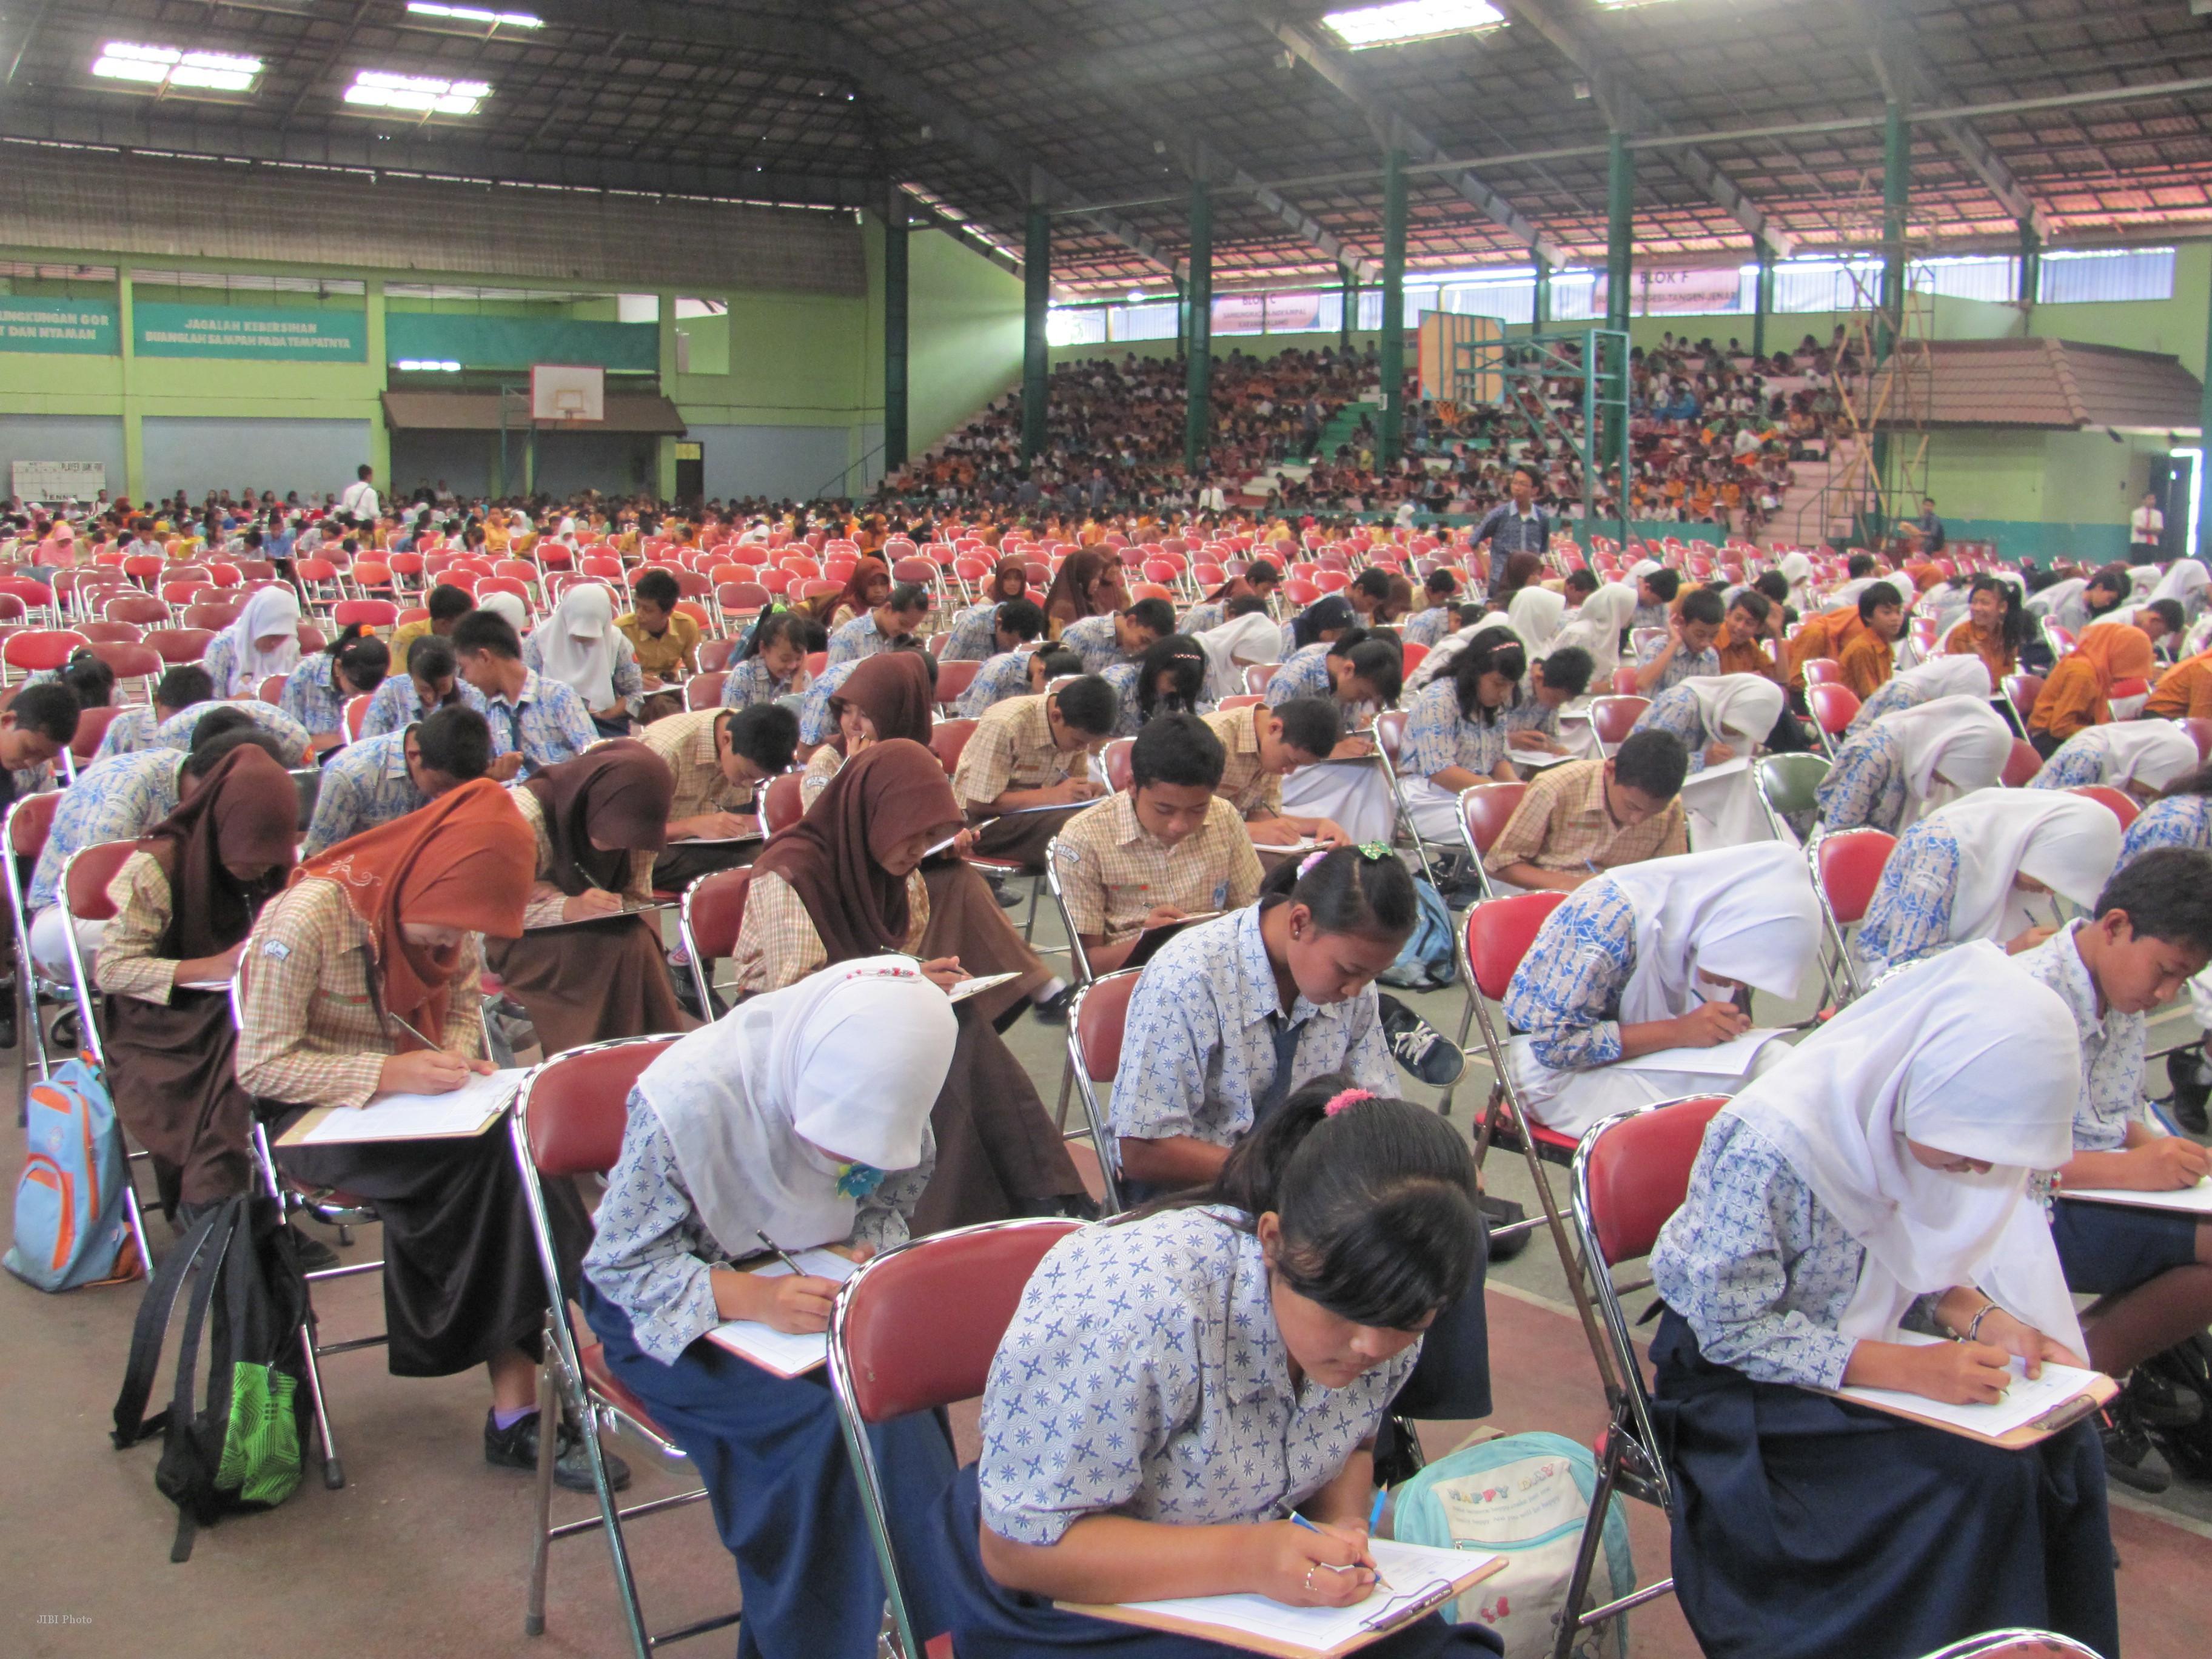 Lomba Kompetensi Siswa Berprestasi Feature 187 Harian Jogja